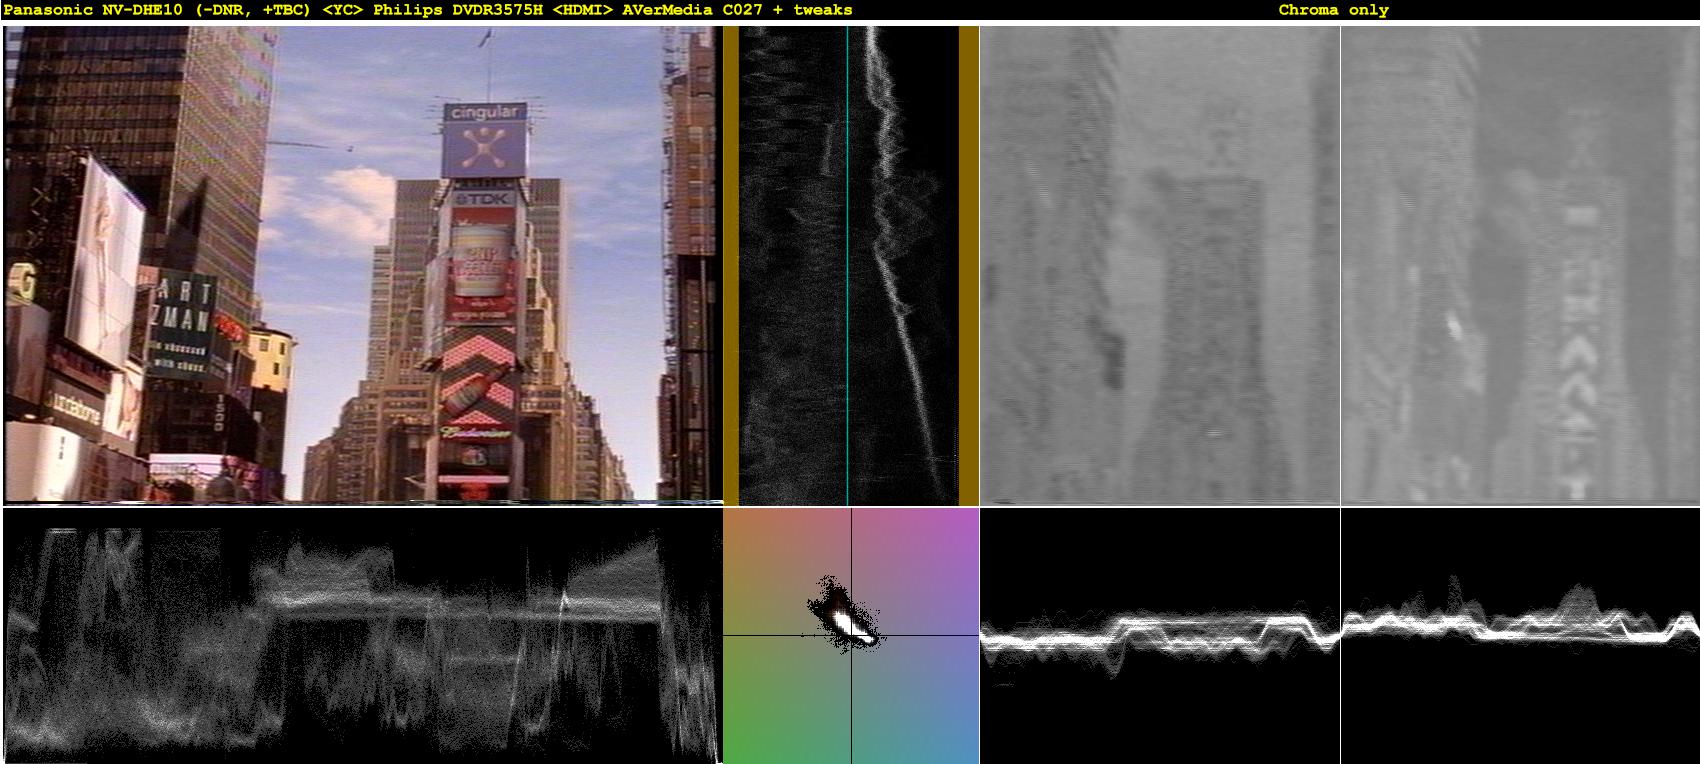 Click image for larger version  Name:1-14-17 - Panasonic NV-DHE10 (-DNR, +TBC).png Views:1200 Size:1.12 MB ID:37999